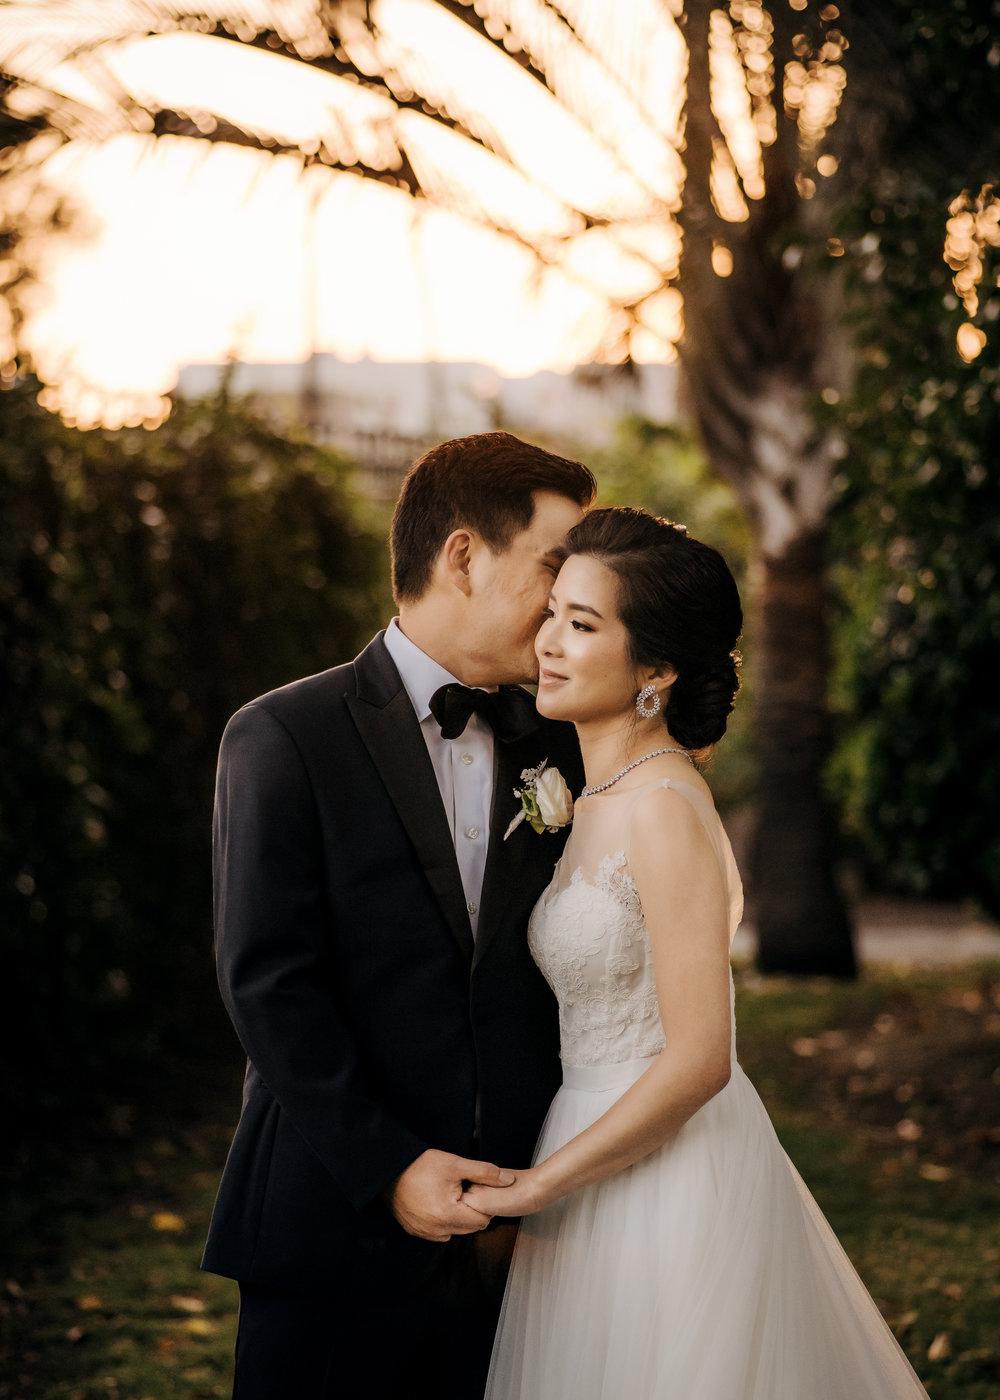 Turchin_20181014_Prim-Jacky-Wedding_331.jpg